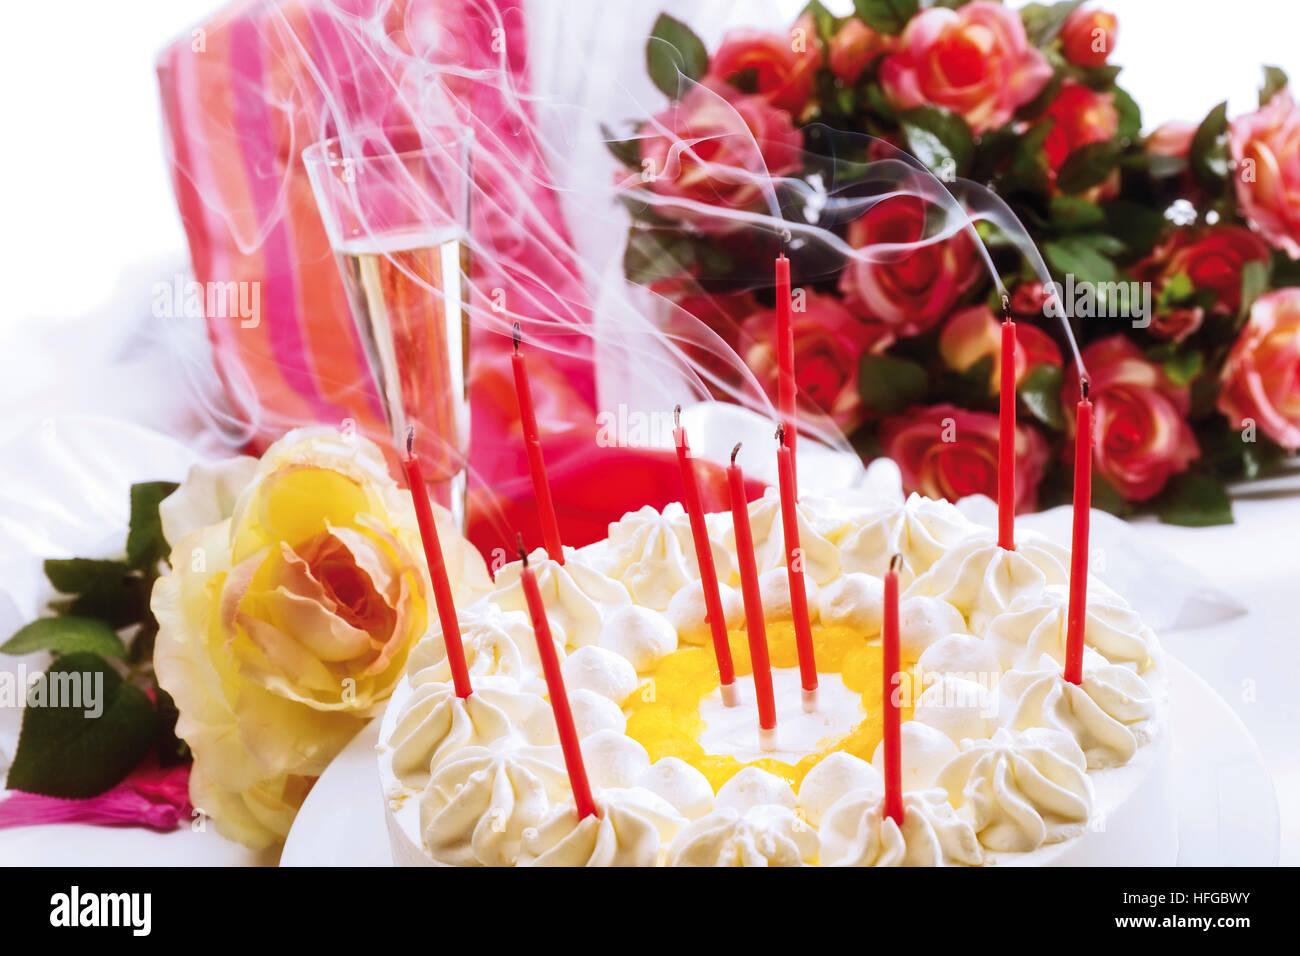 Birthday Cake Decorated Candles Roses Stock Photos Birthday Cake